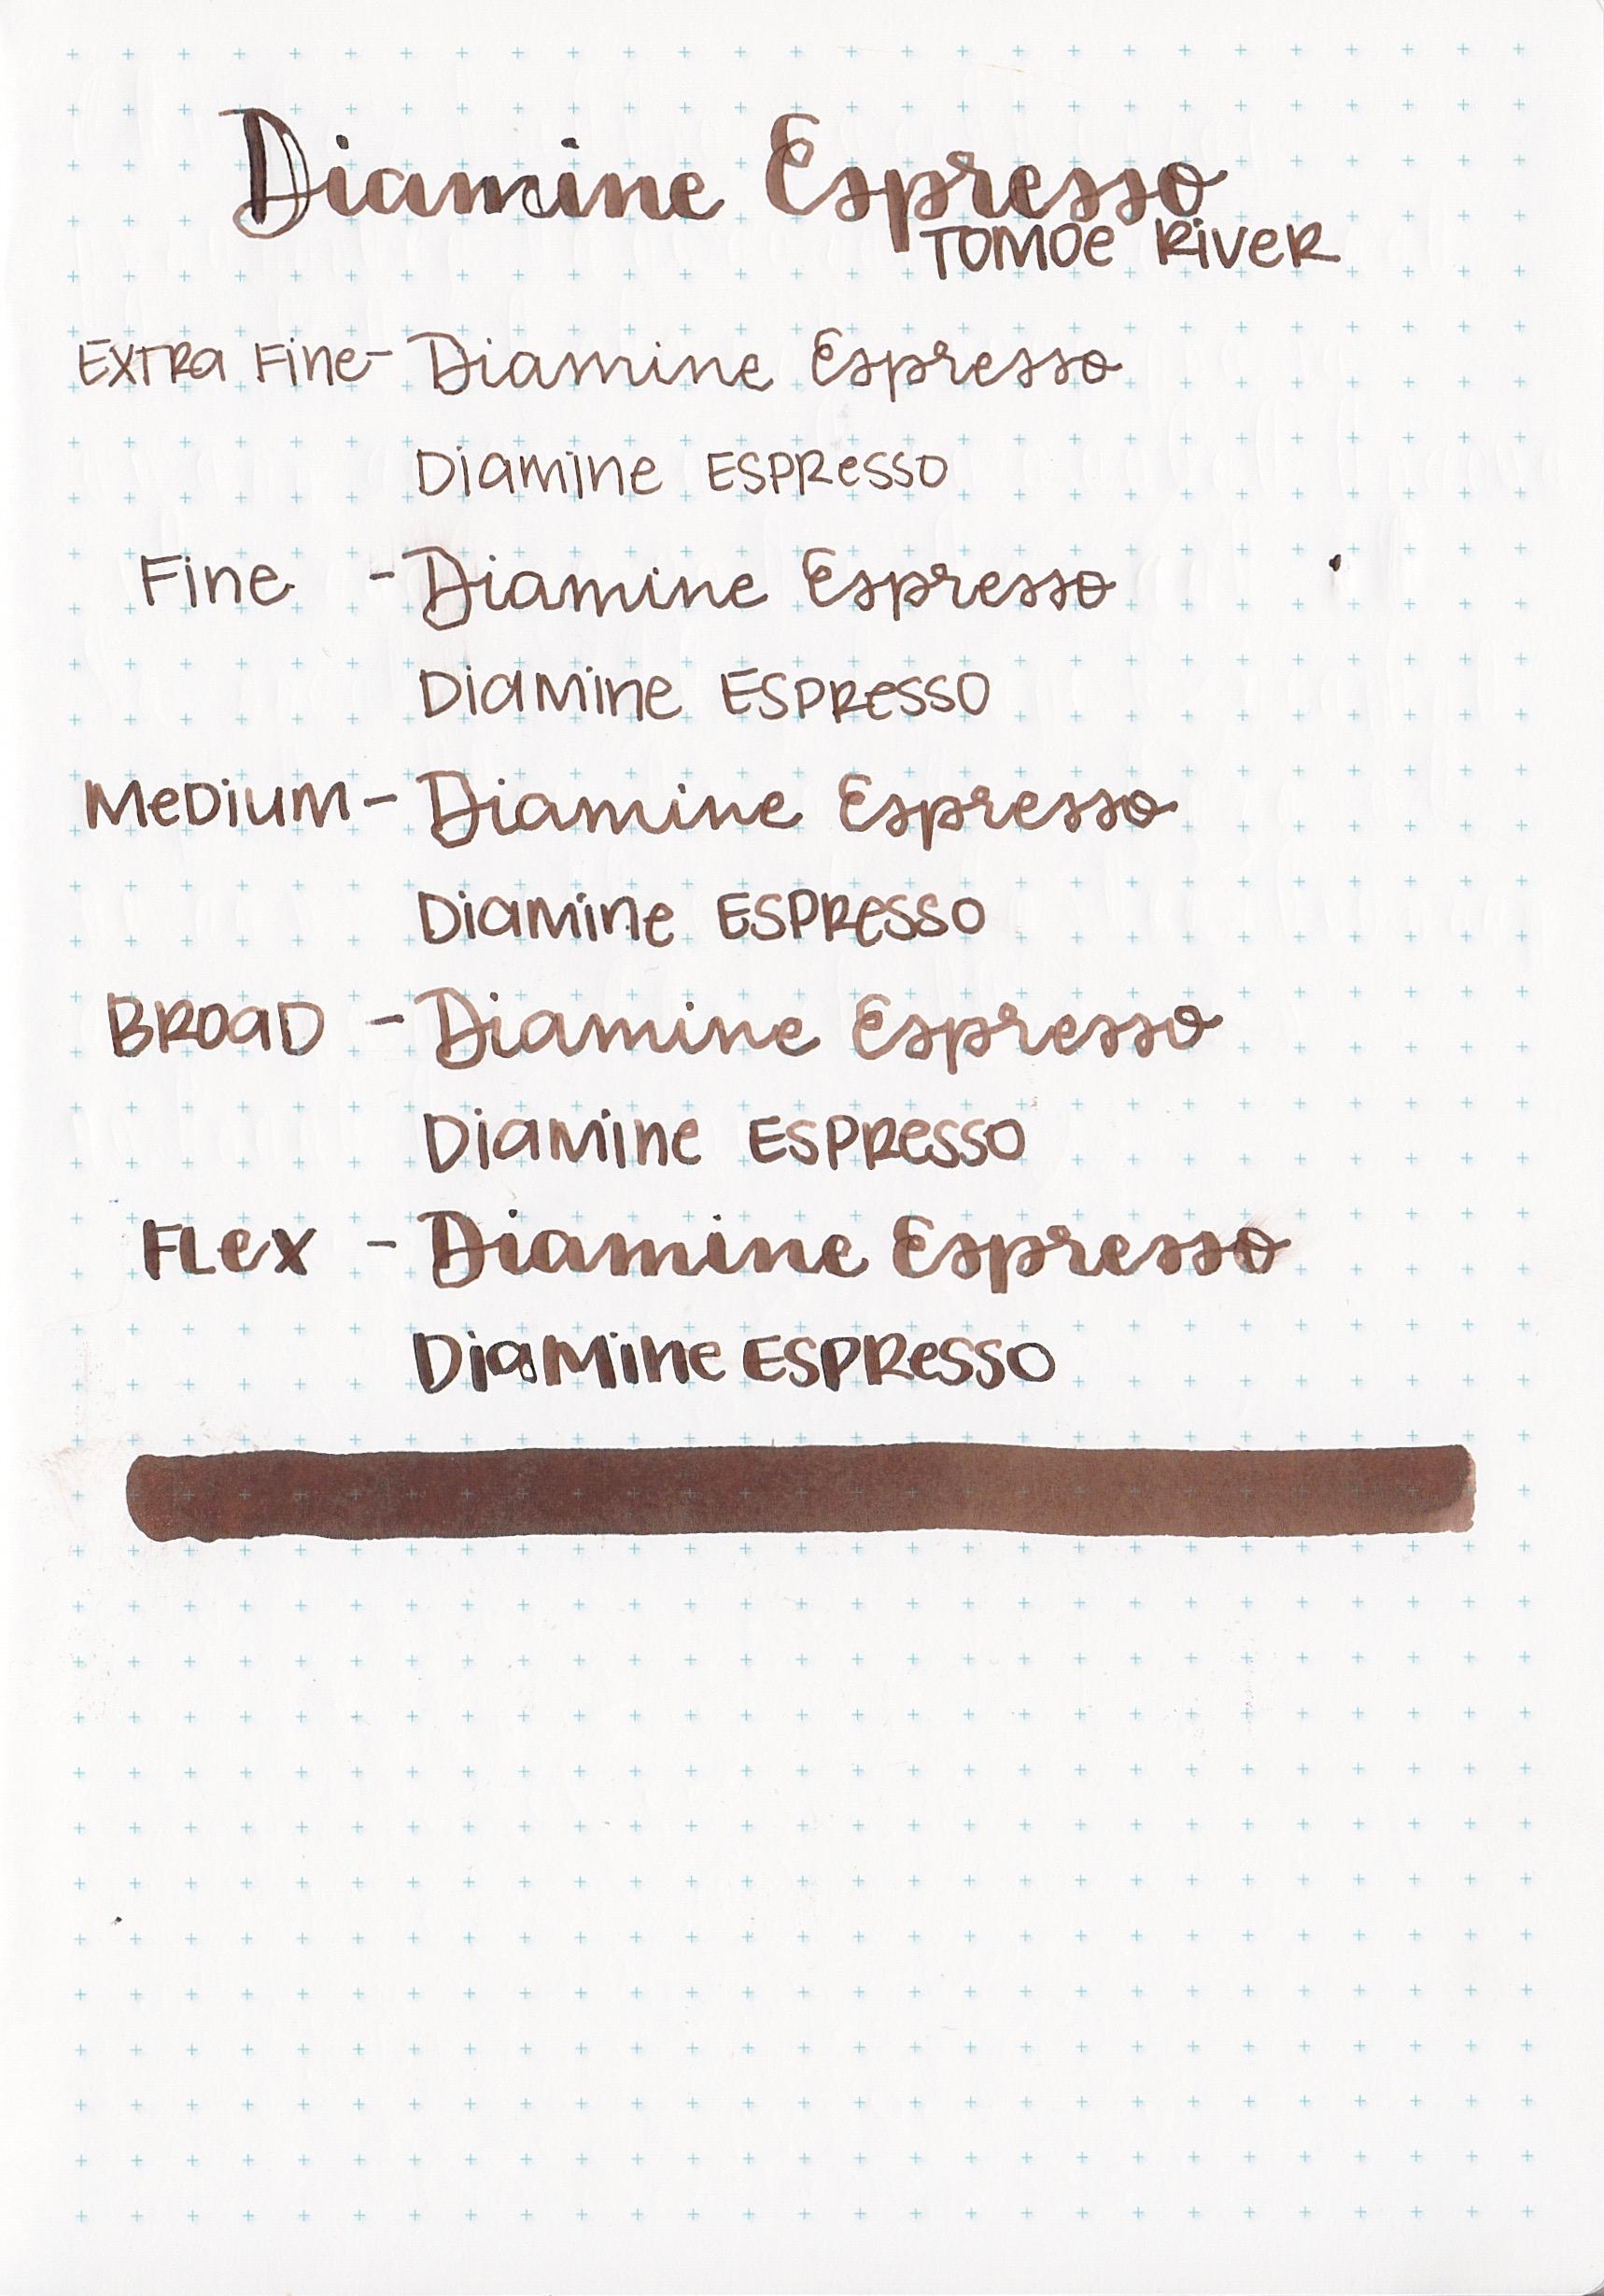 DEspresso - 14.jpg